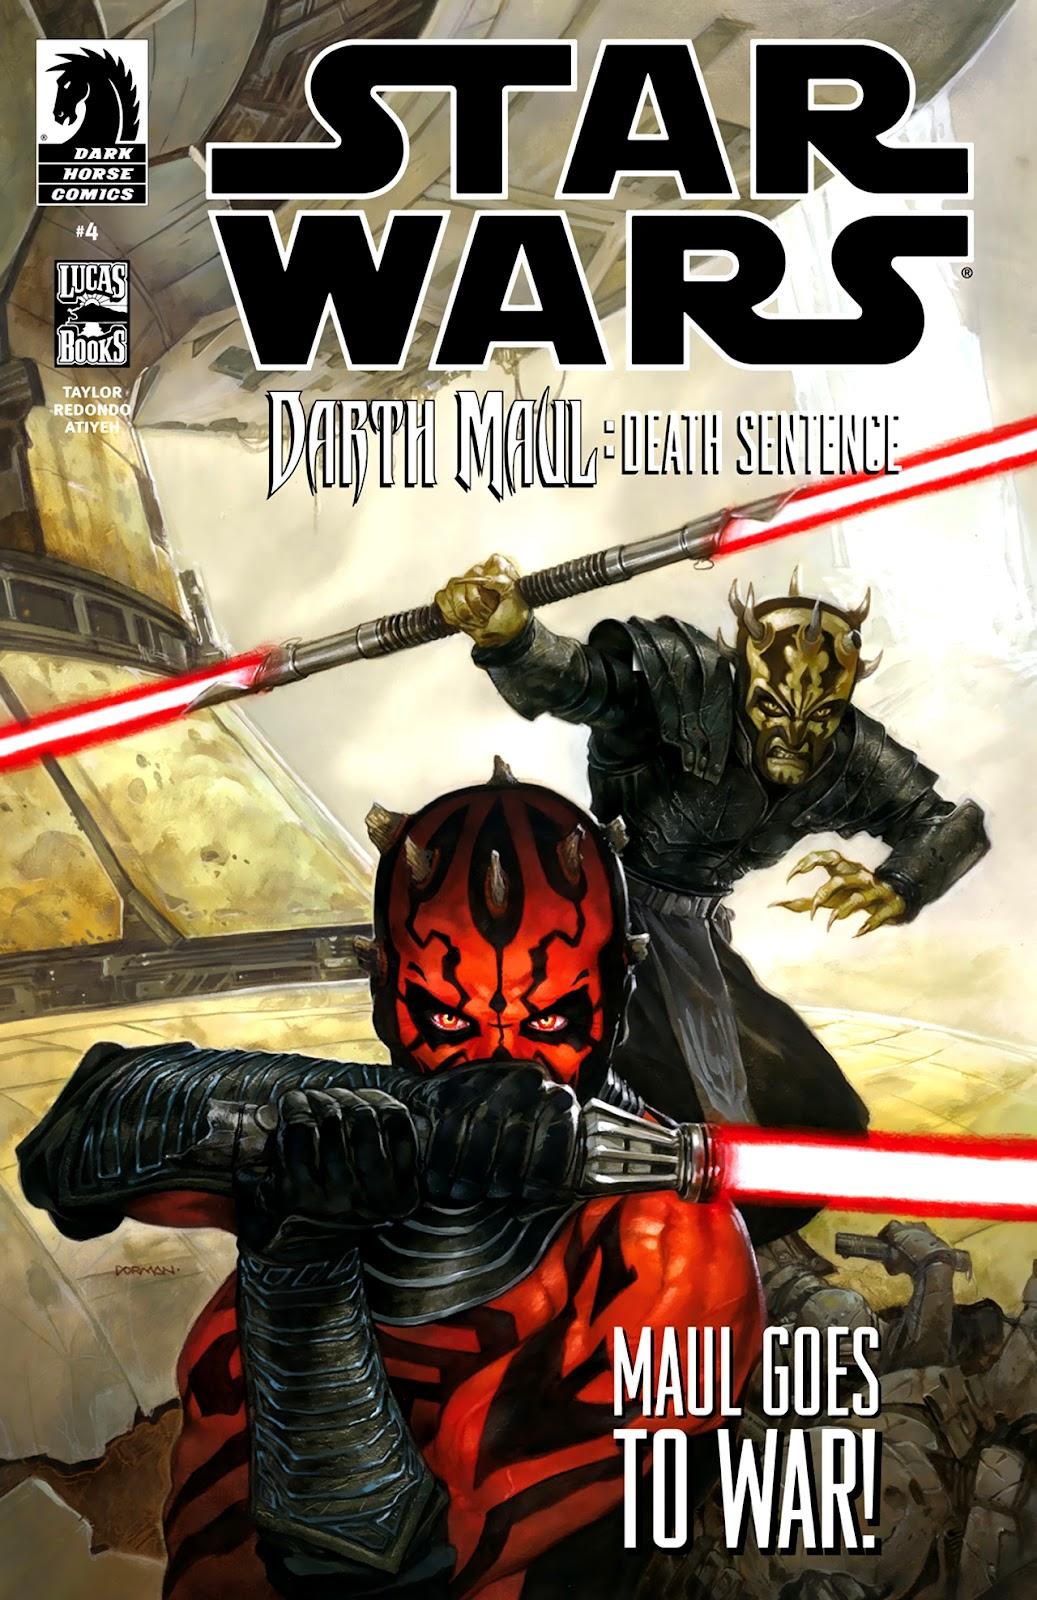 Star Wars: Darth Maul - Death Sentence 4 Page 1